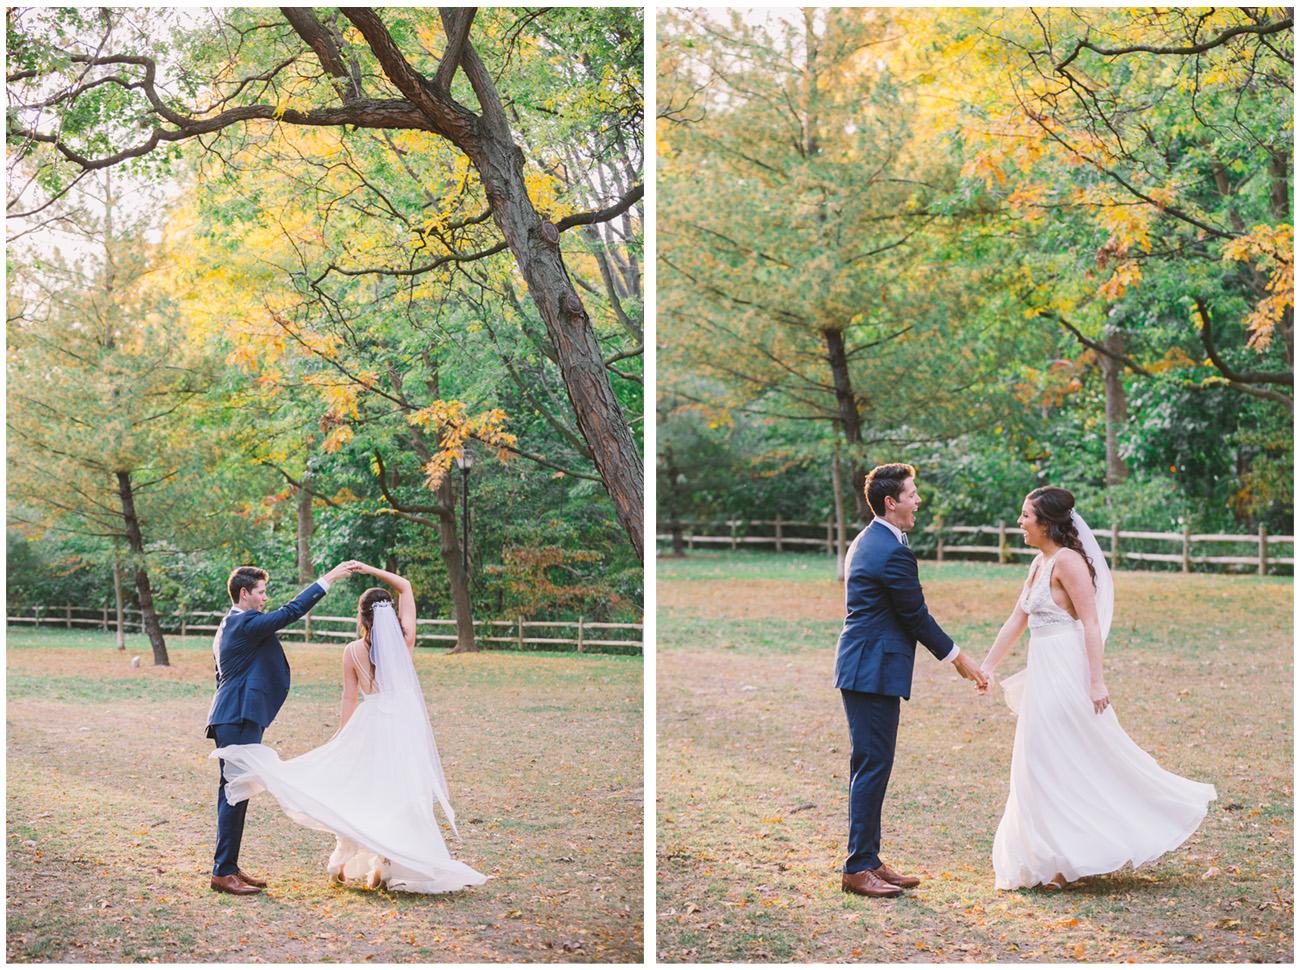 Wedding couple dancing in Craigleigh Gardens park in the fall.